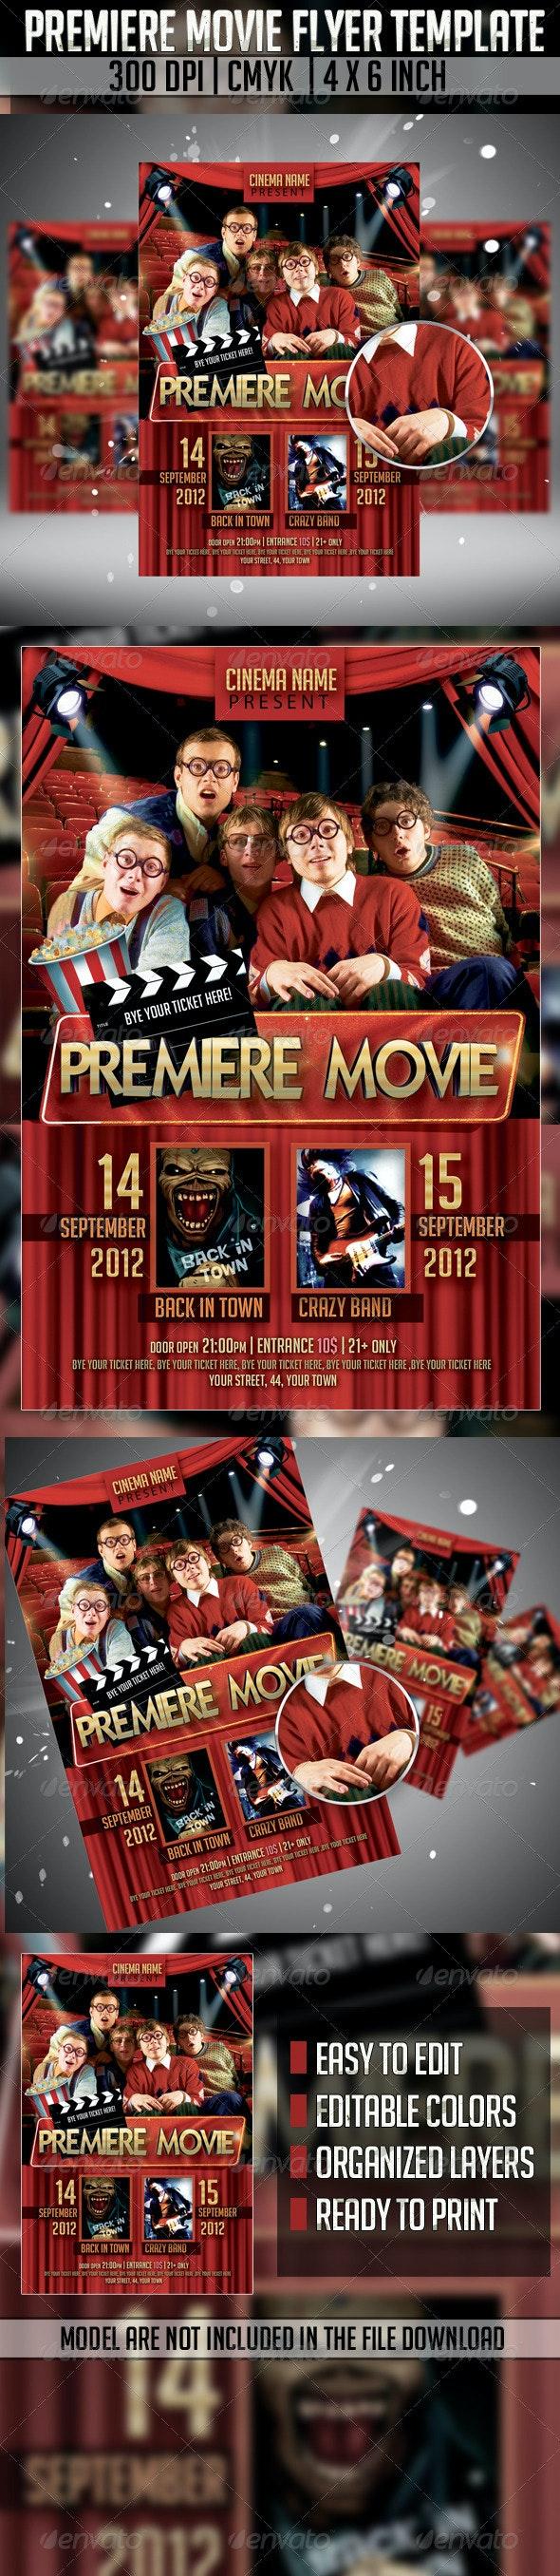 Premiere Movie Flyer Template - Miscellaneous Events